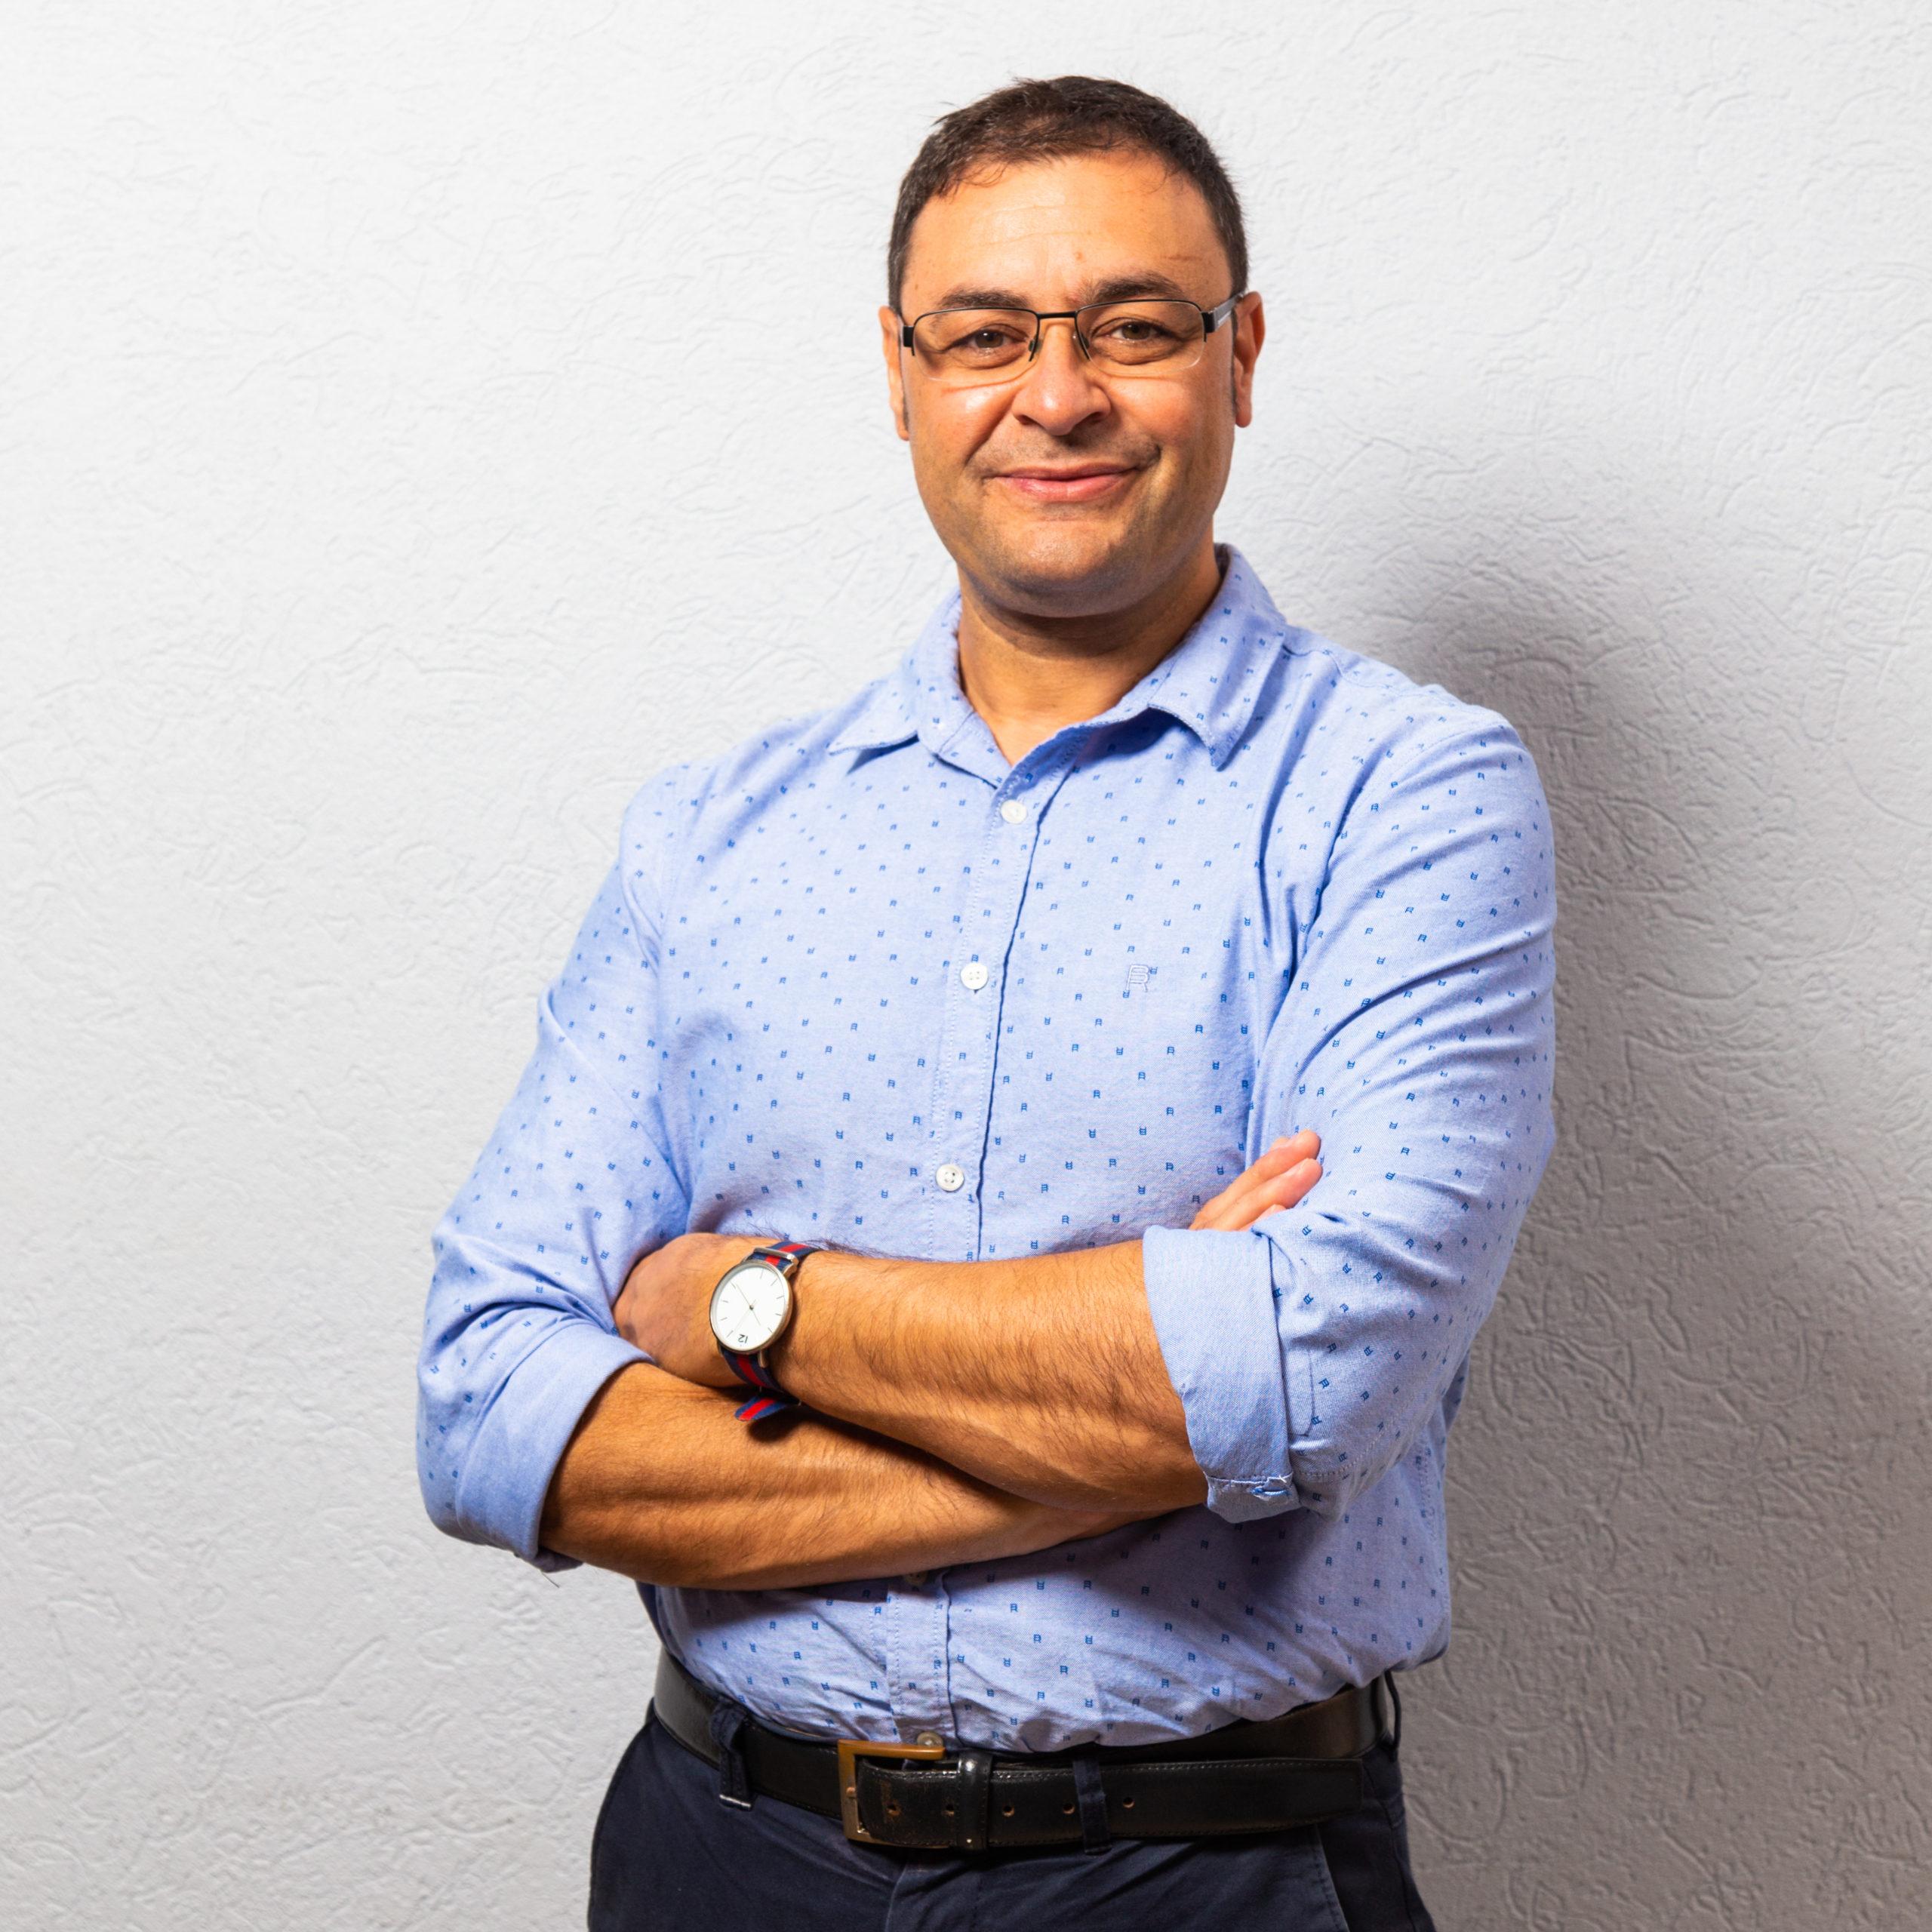 Mohamed El Oualkadi